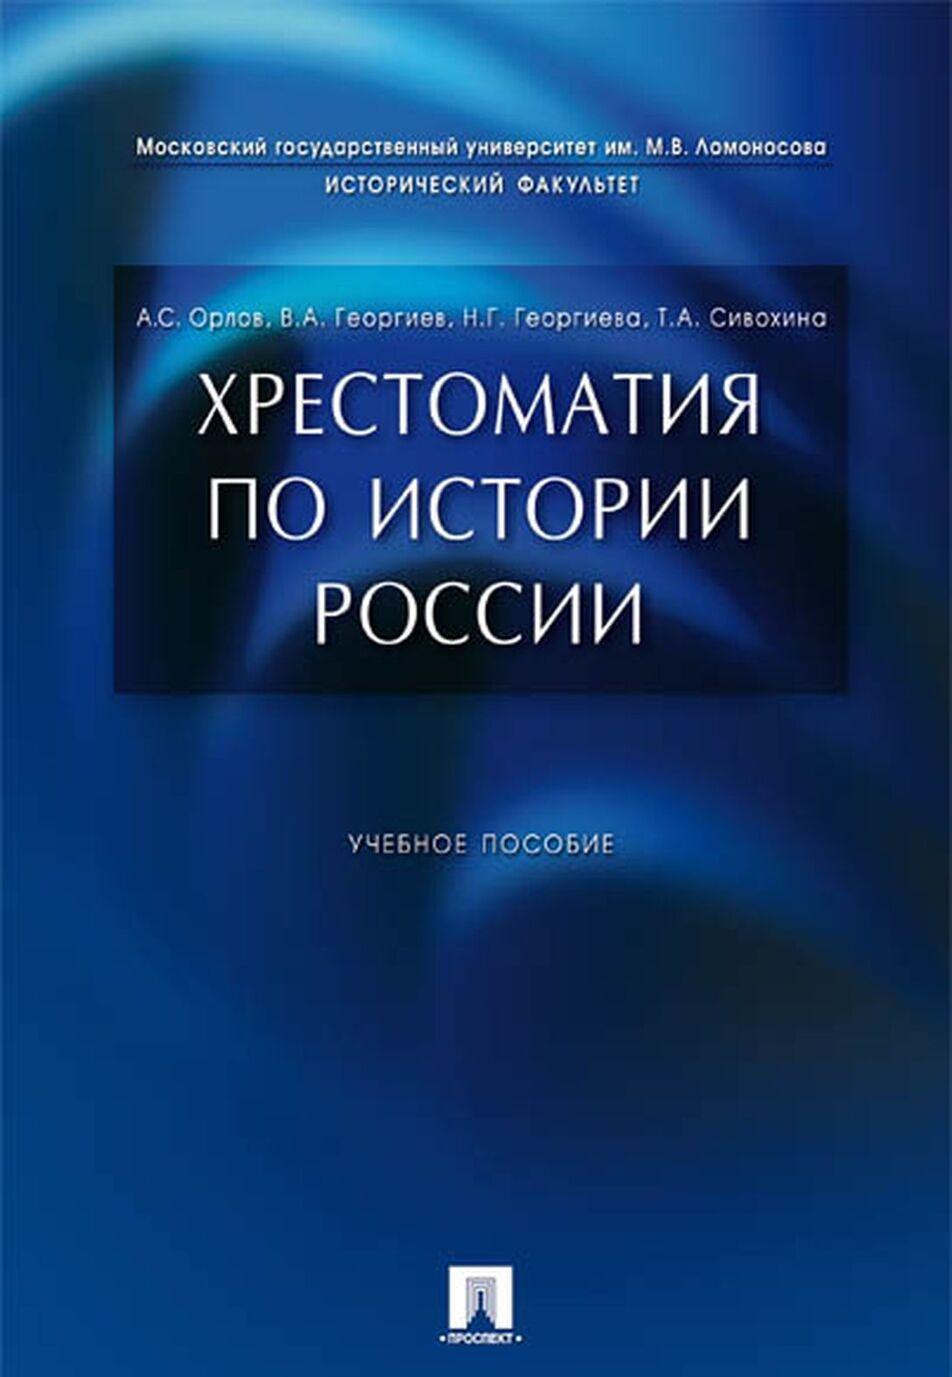 Khrestomatija po istorii Rossii